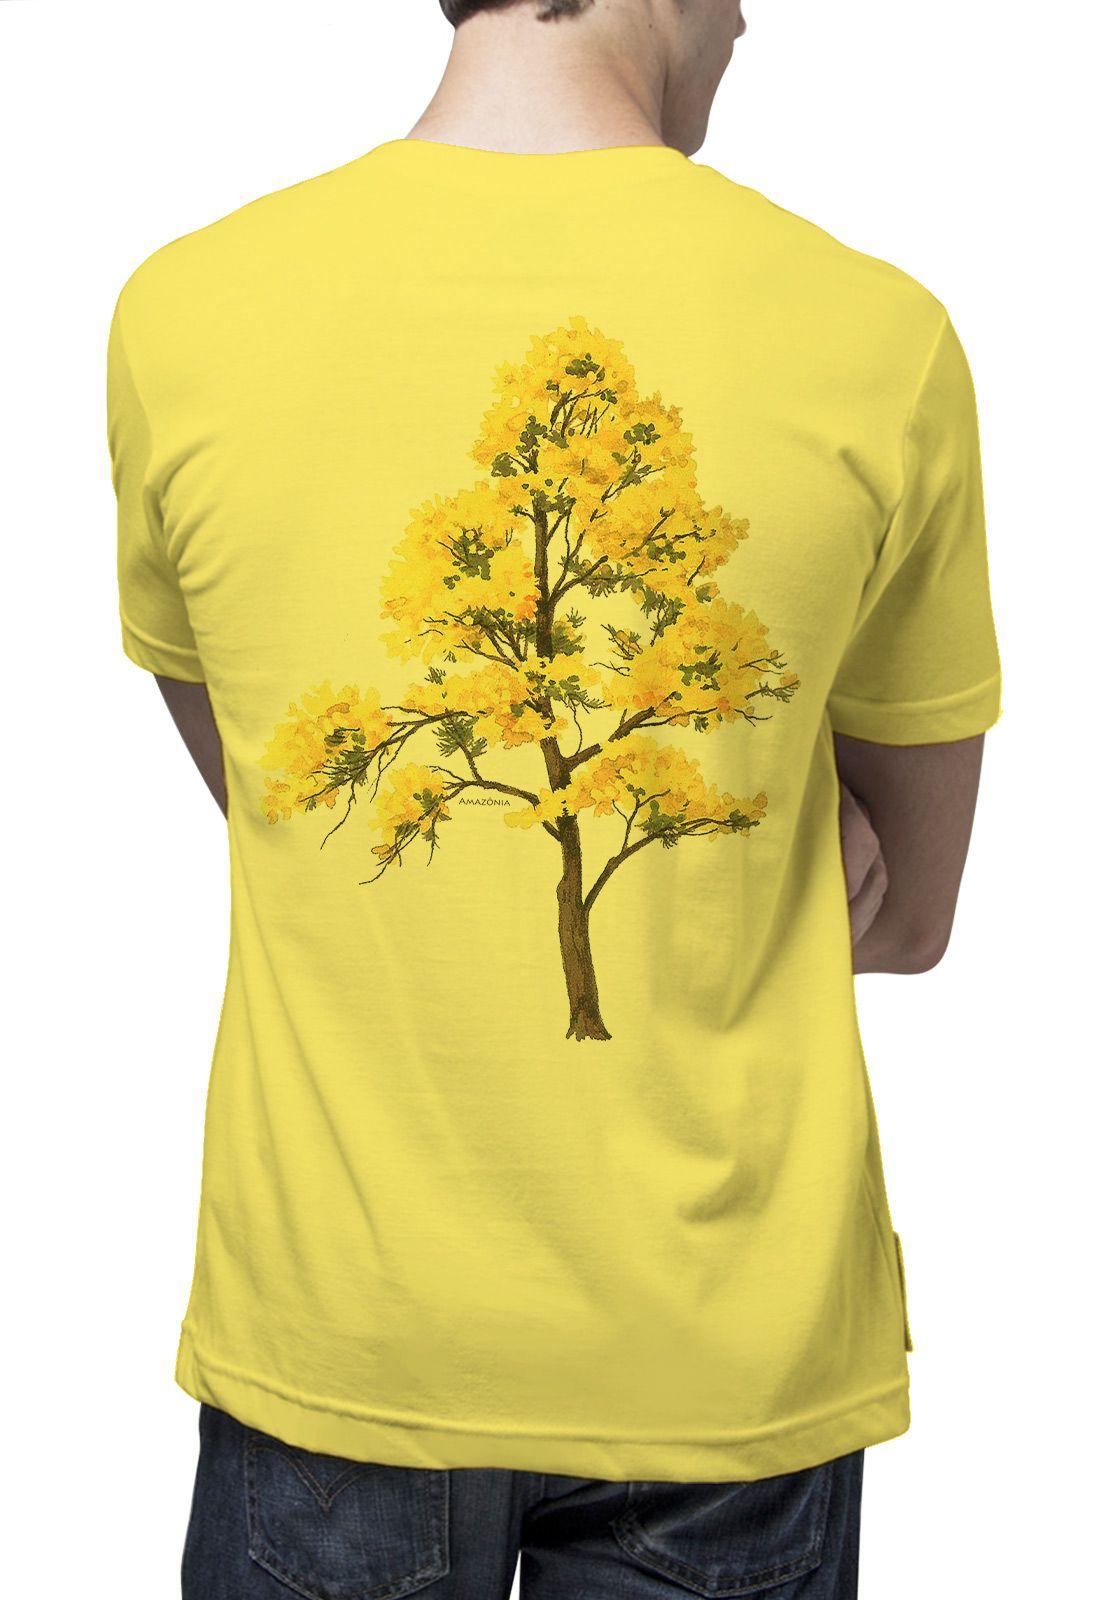 Camiseta Amazônia Ipê Amarelo - Amarelo